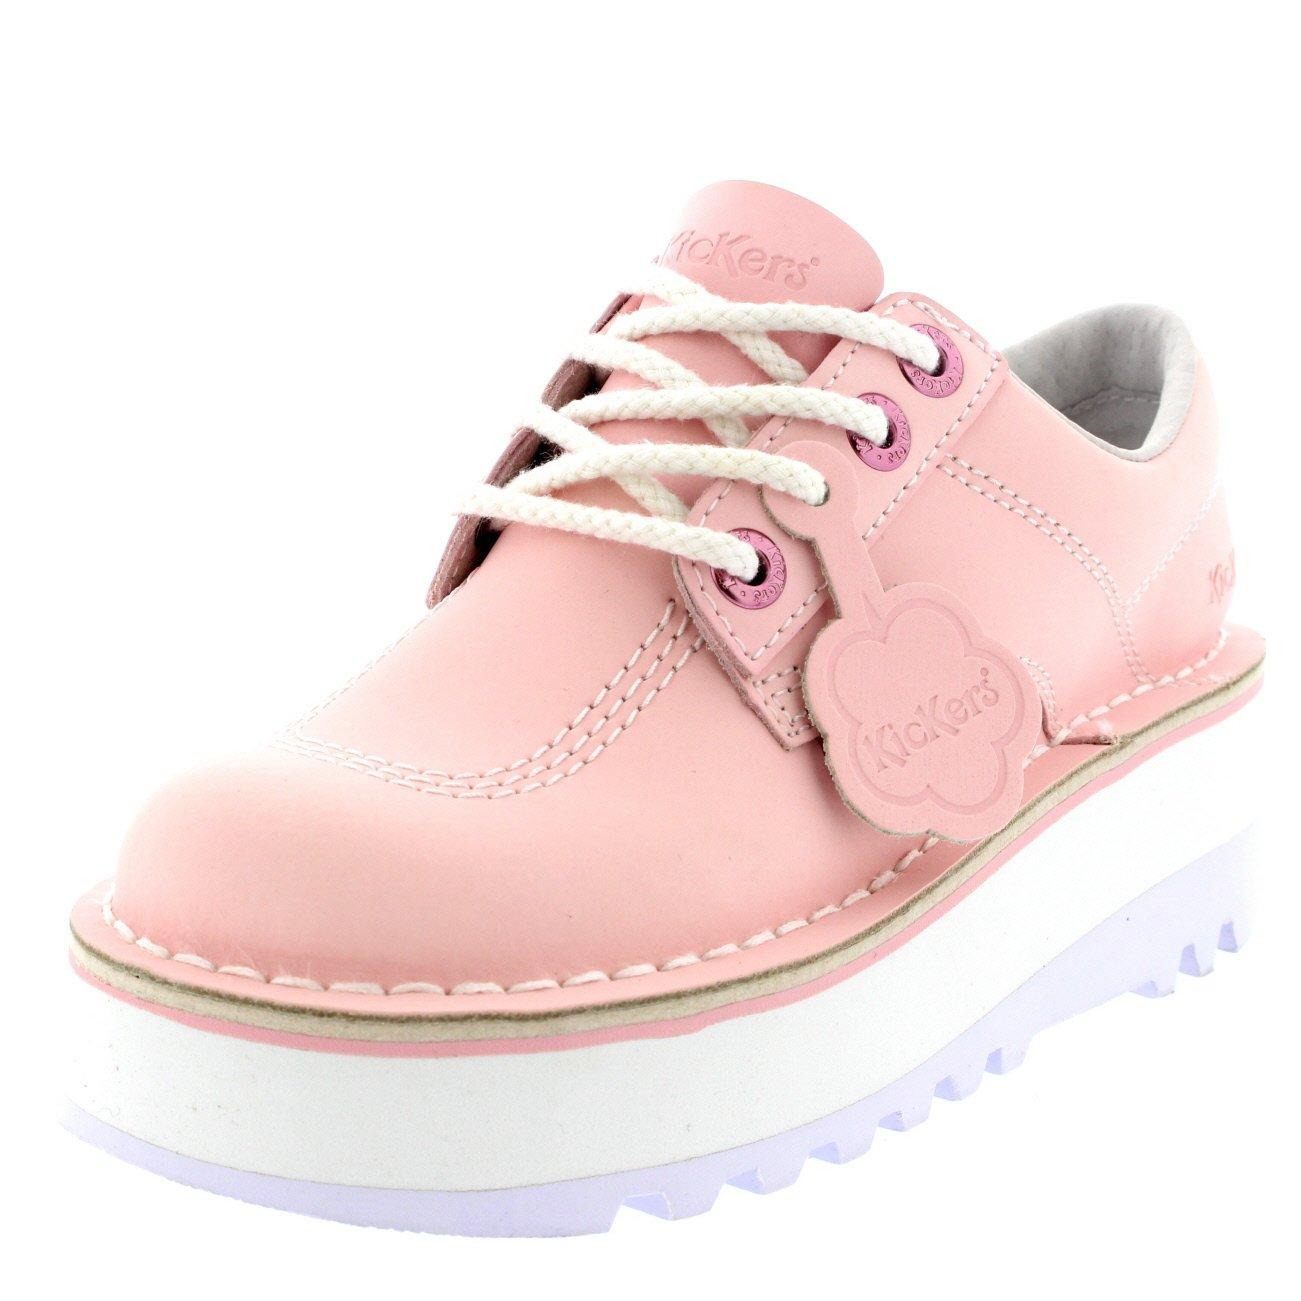 cde32ba8f9a Kickers Womens Kick Lo Eye Stack Wedges Platform Pale Pink Heels Shoes - Light  Pink - 10.5  Amazon.co.uk  Shoes   Bags